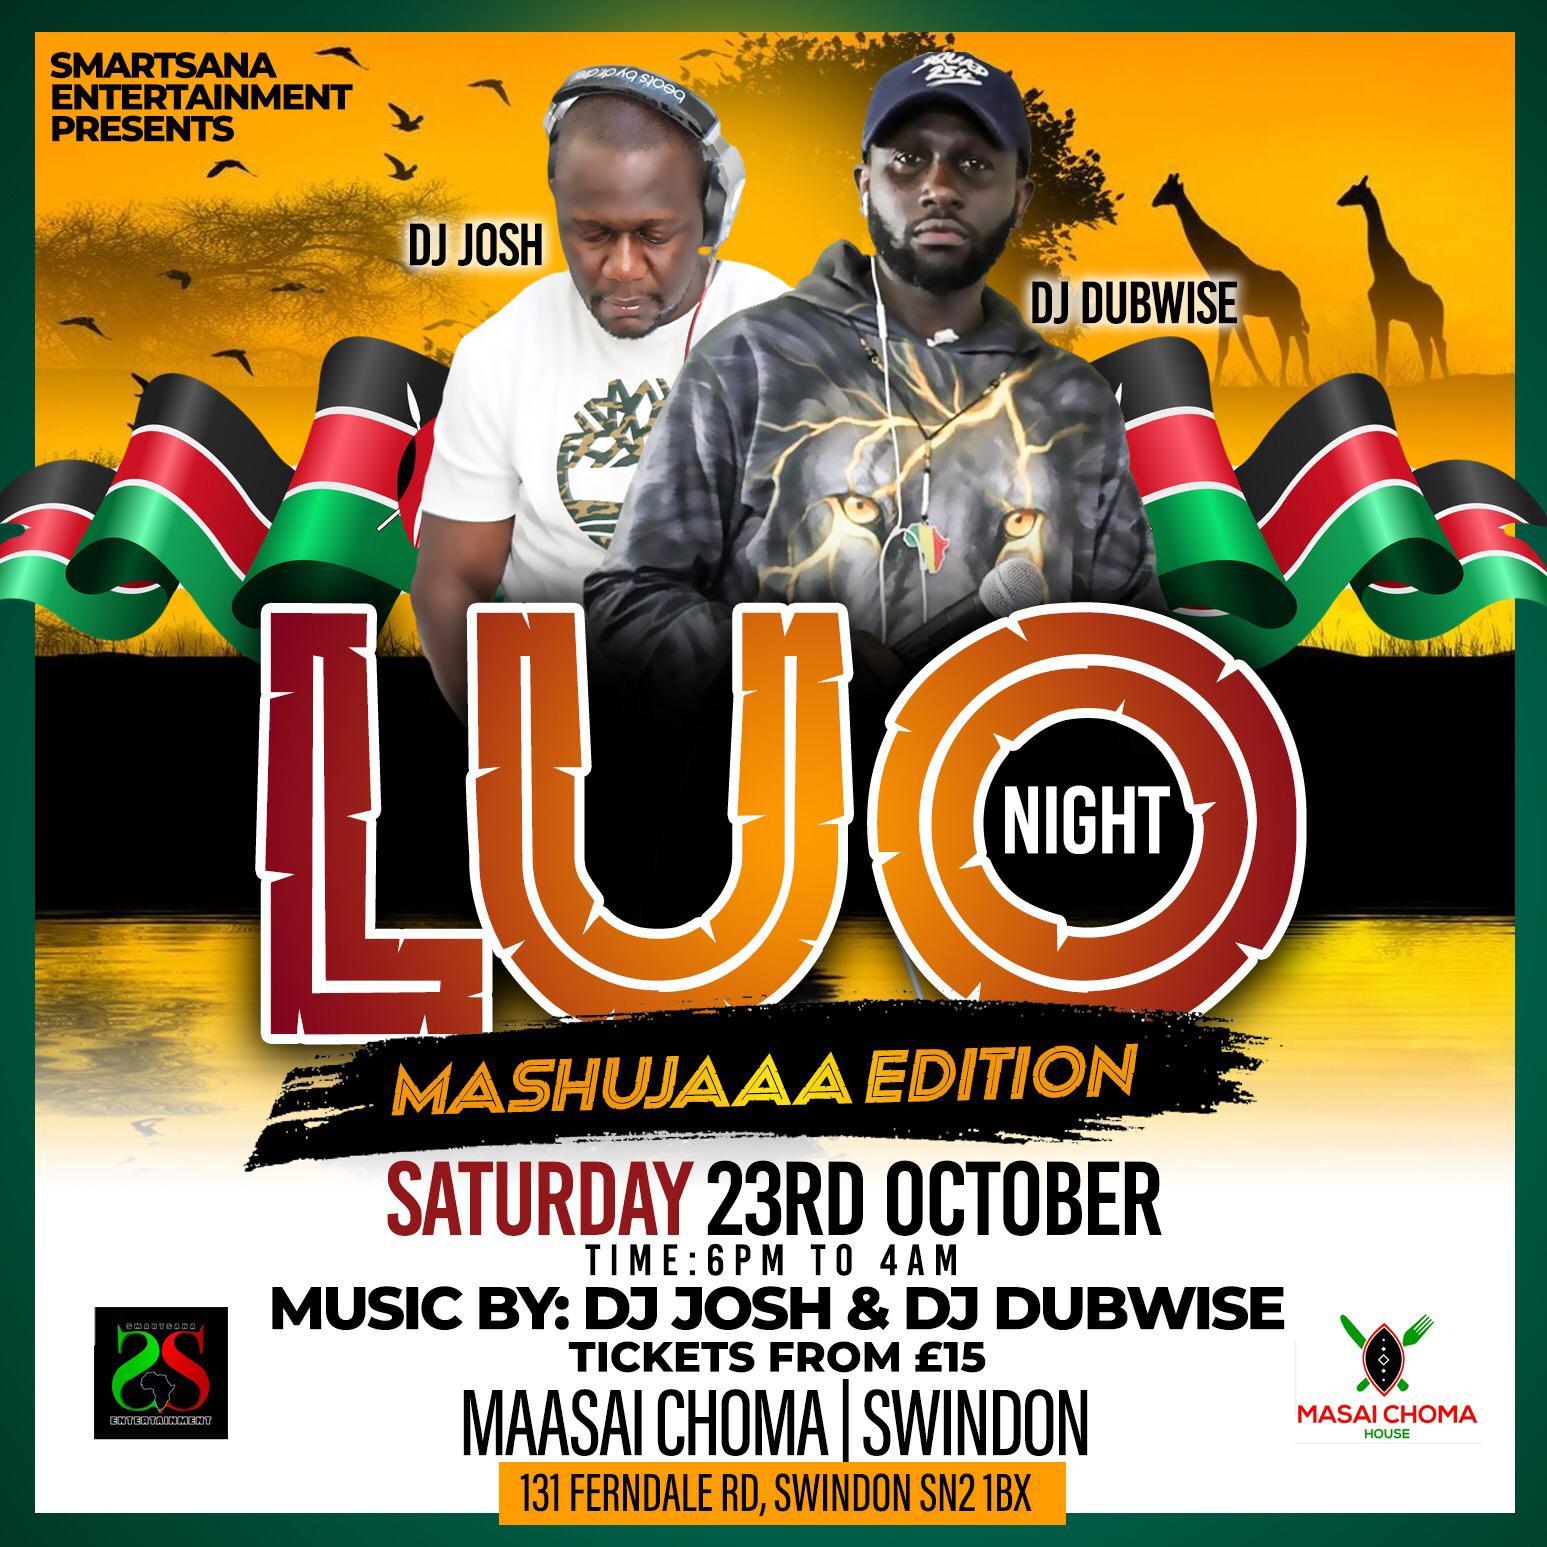 LUO NIGHT/Mashujaa Edition